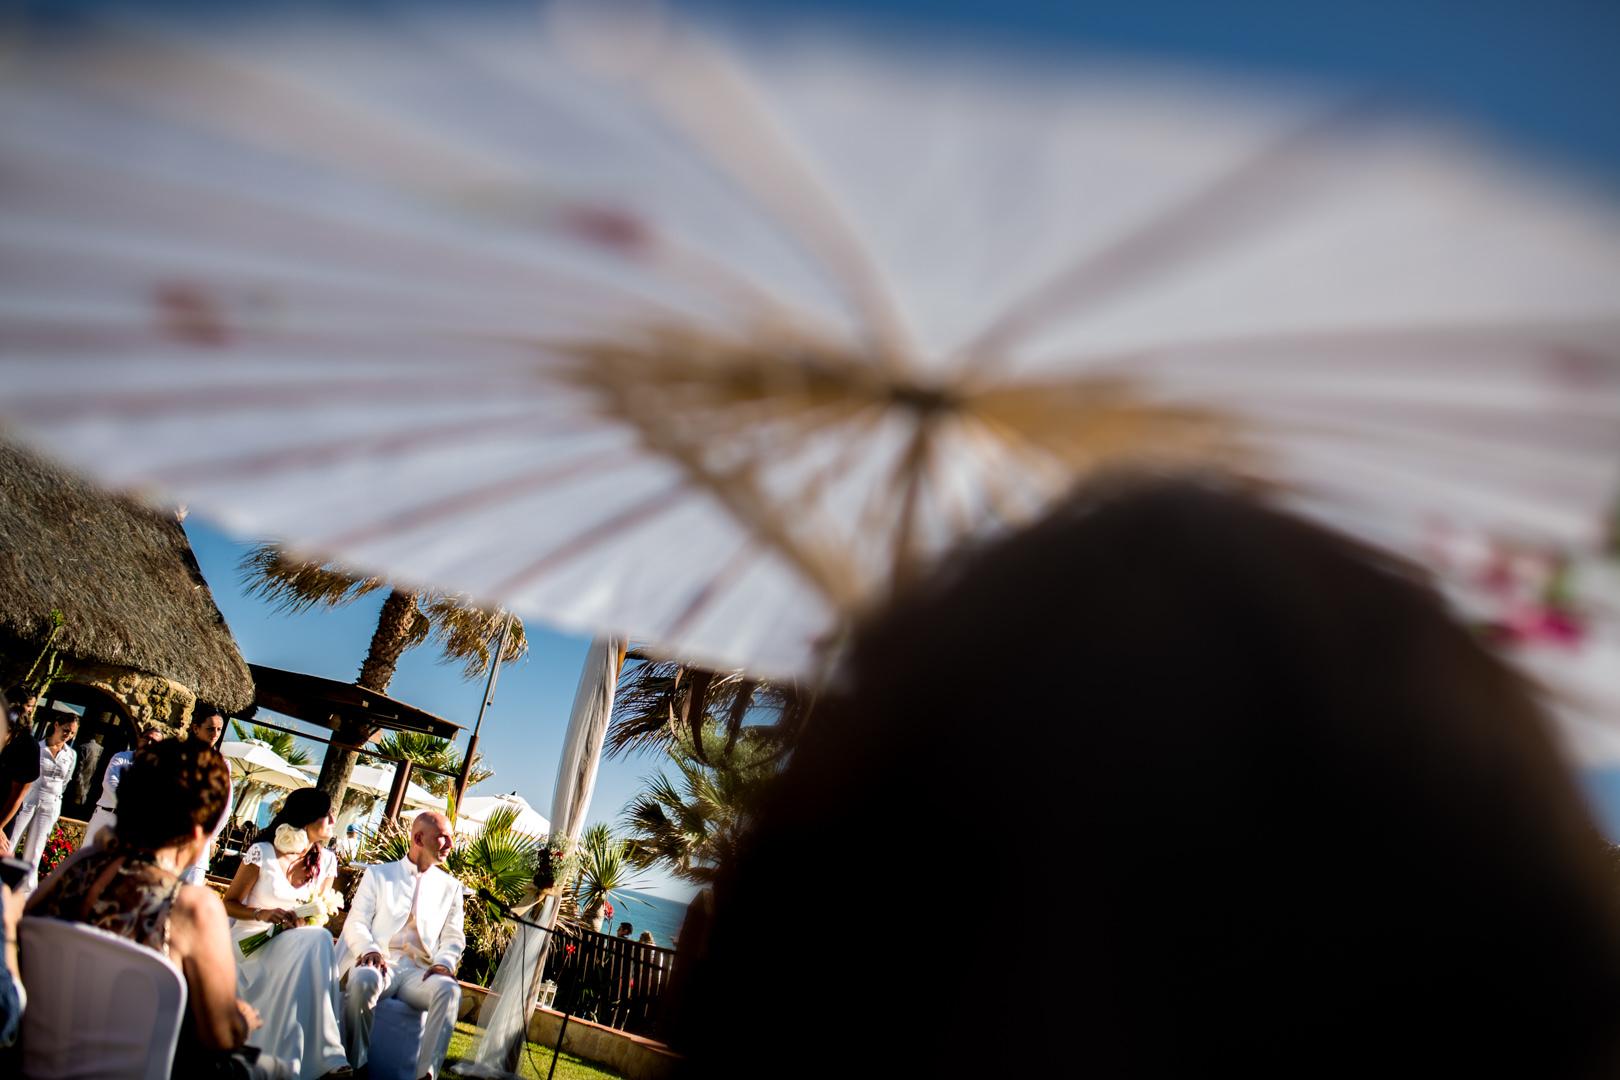 Boda-Sajorami-Beach-Cadiz-Zahora-Pedro-Gema-engagement-Rafael-Torres-fotografo-bodas-sevilla-madrid-barcelona-wedding-photographer--27.jpg